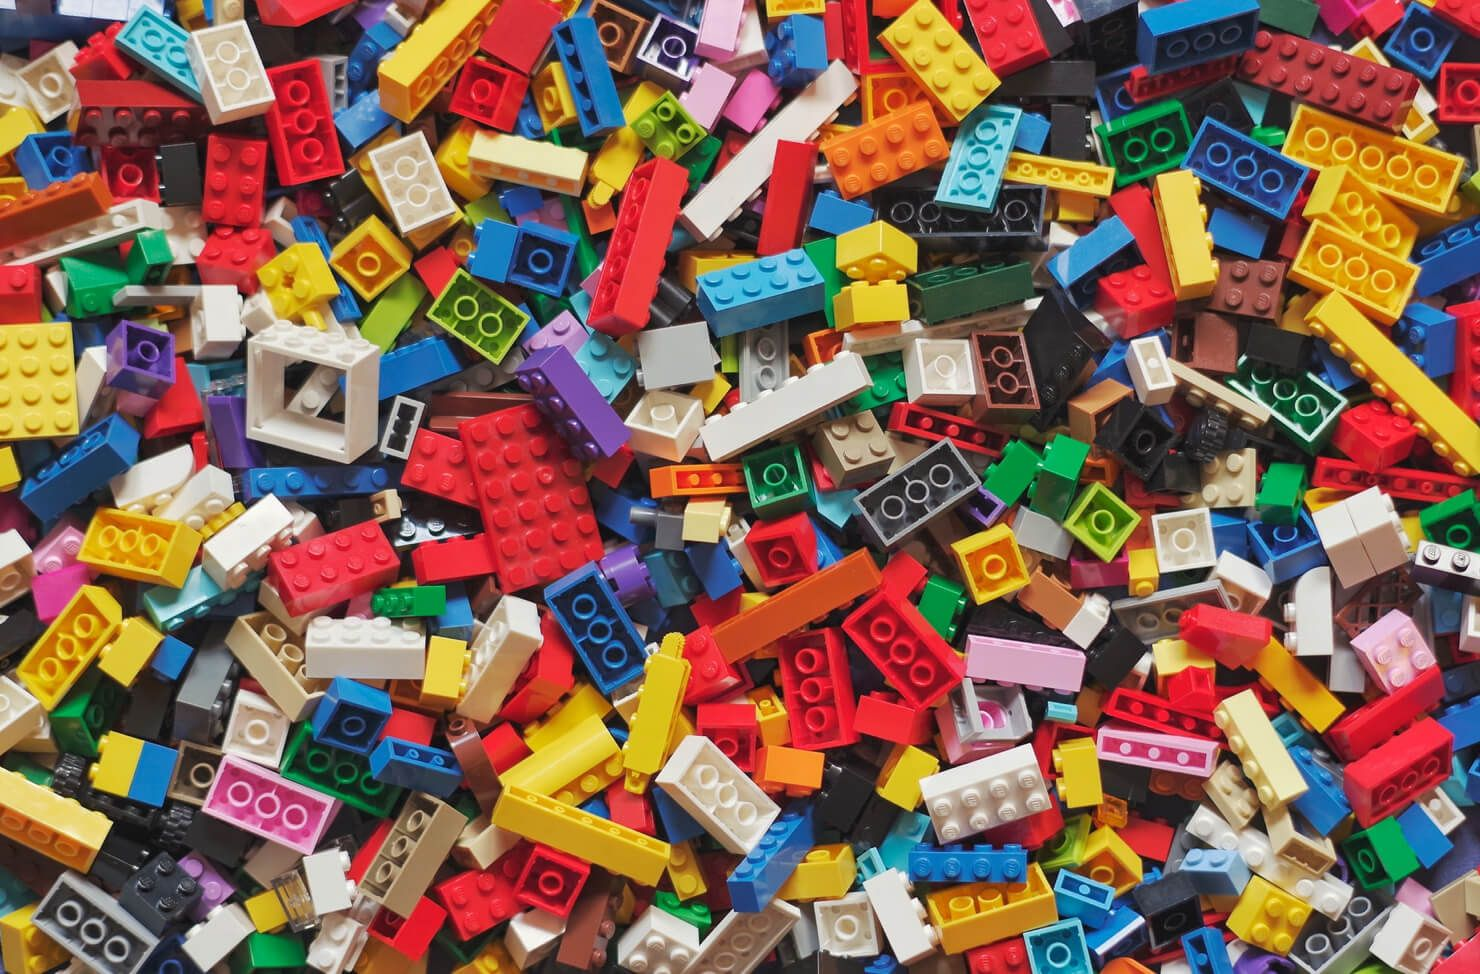 bric-a-brac toys